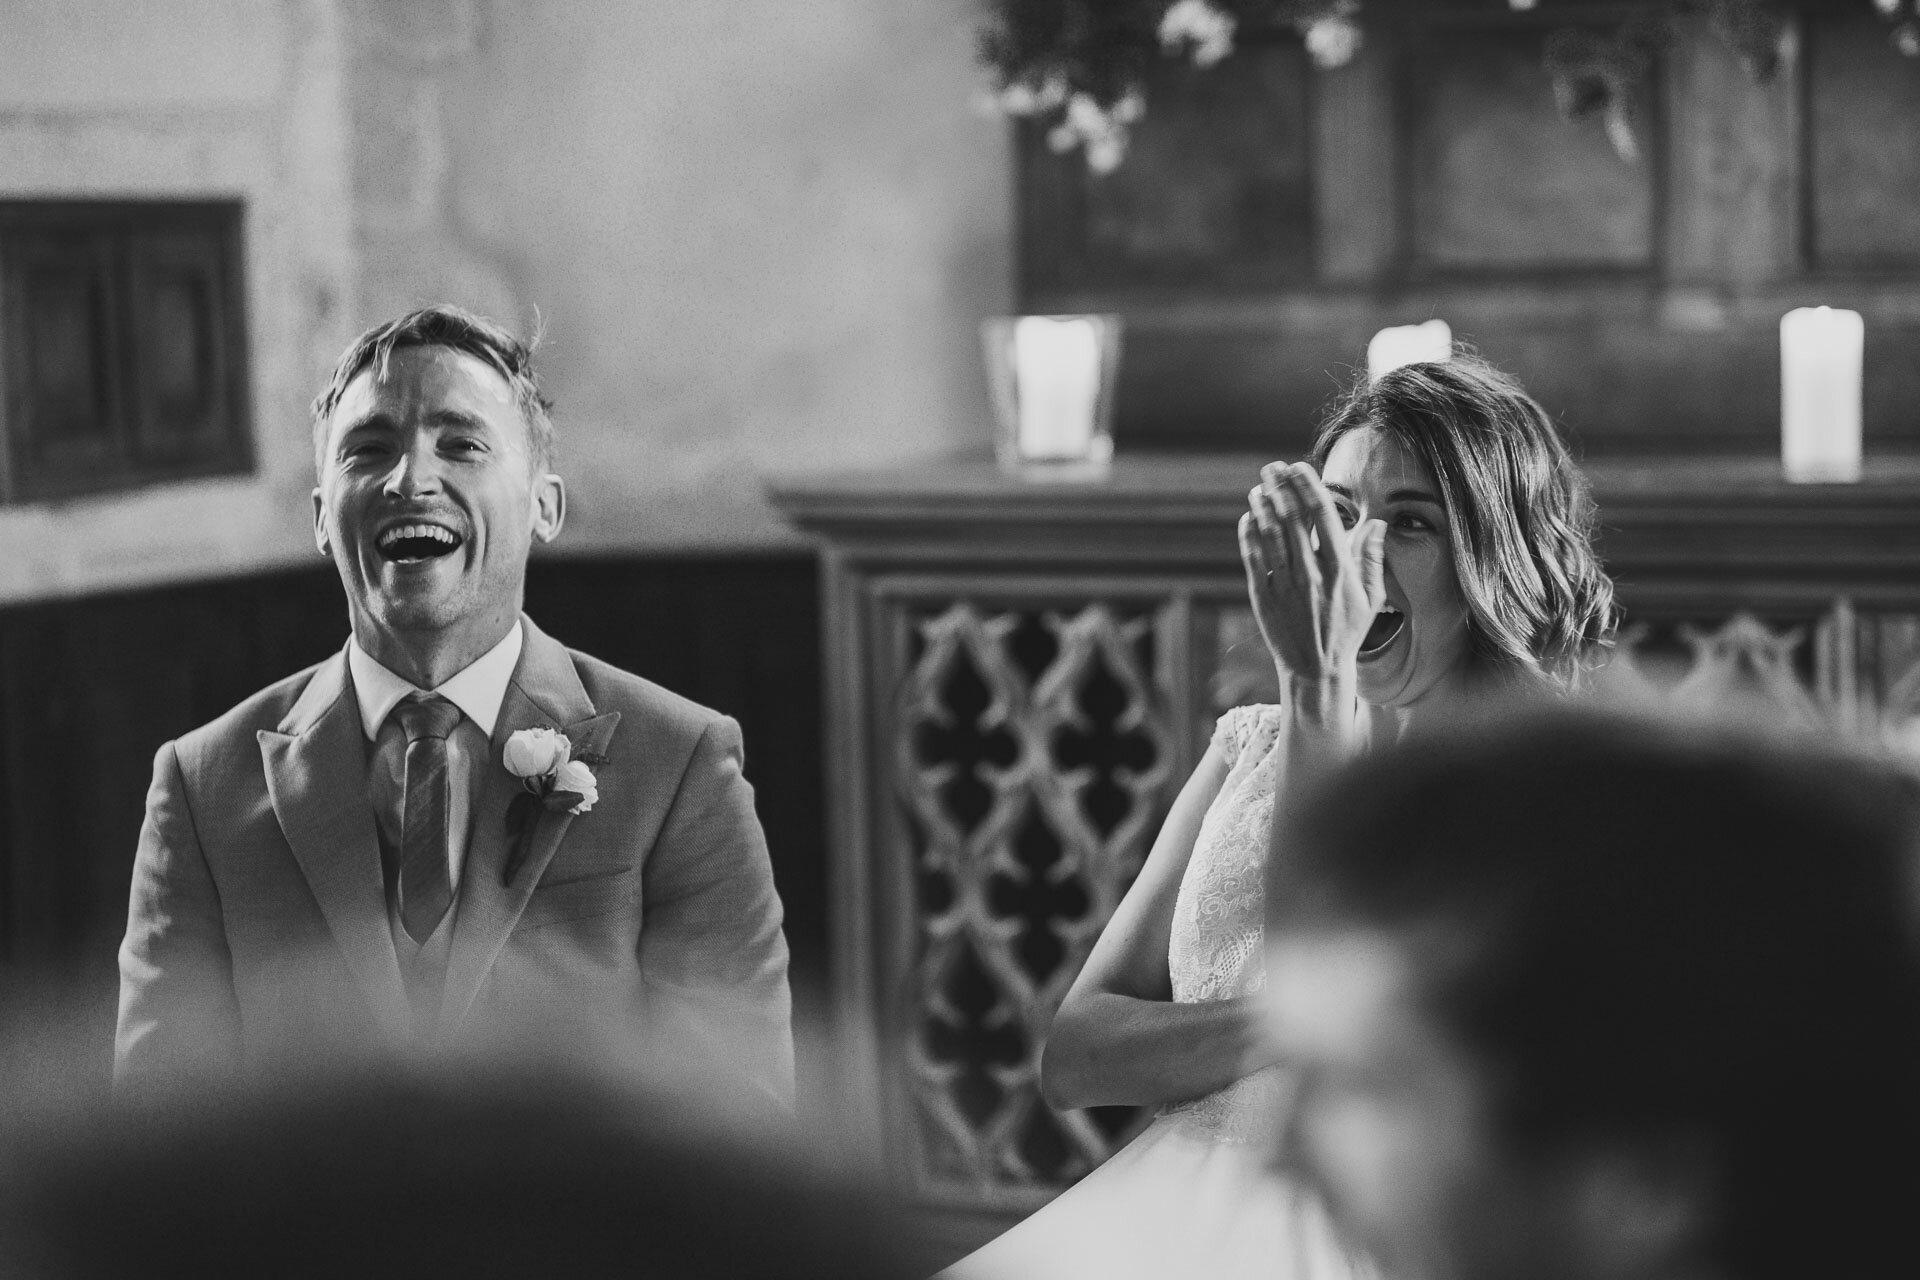 dorset_wedding_photographer-47.jpg